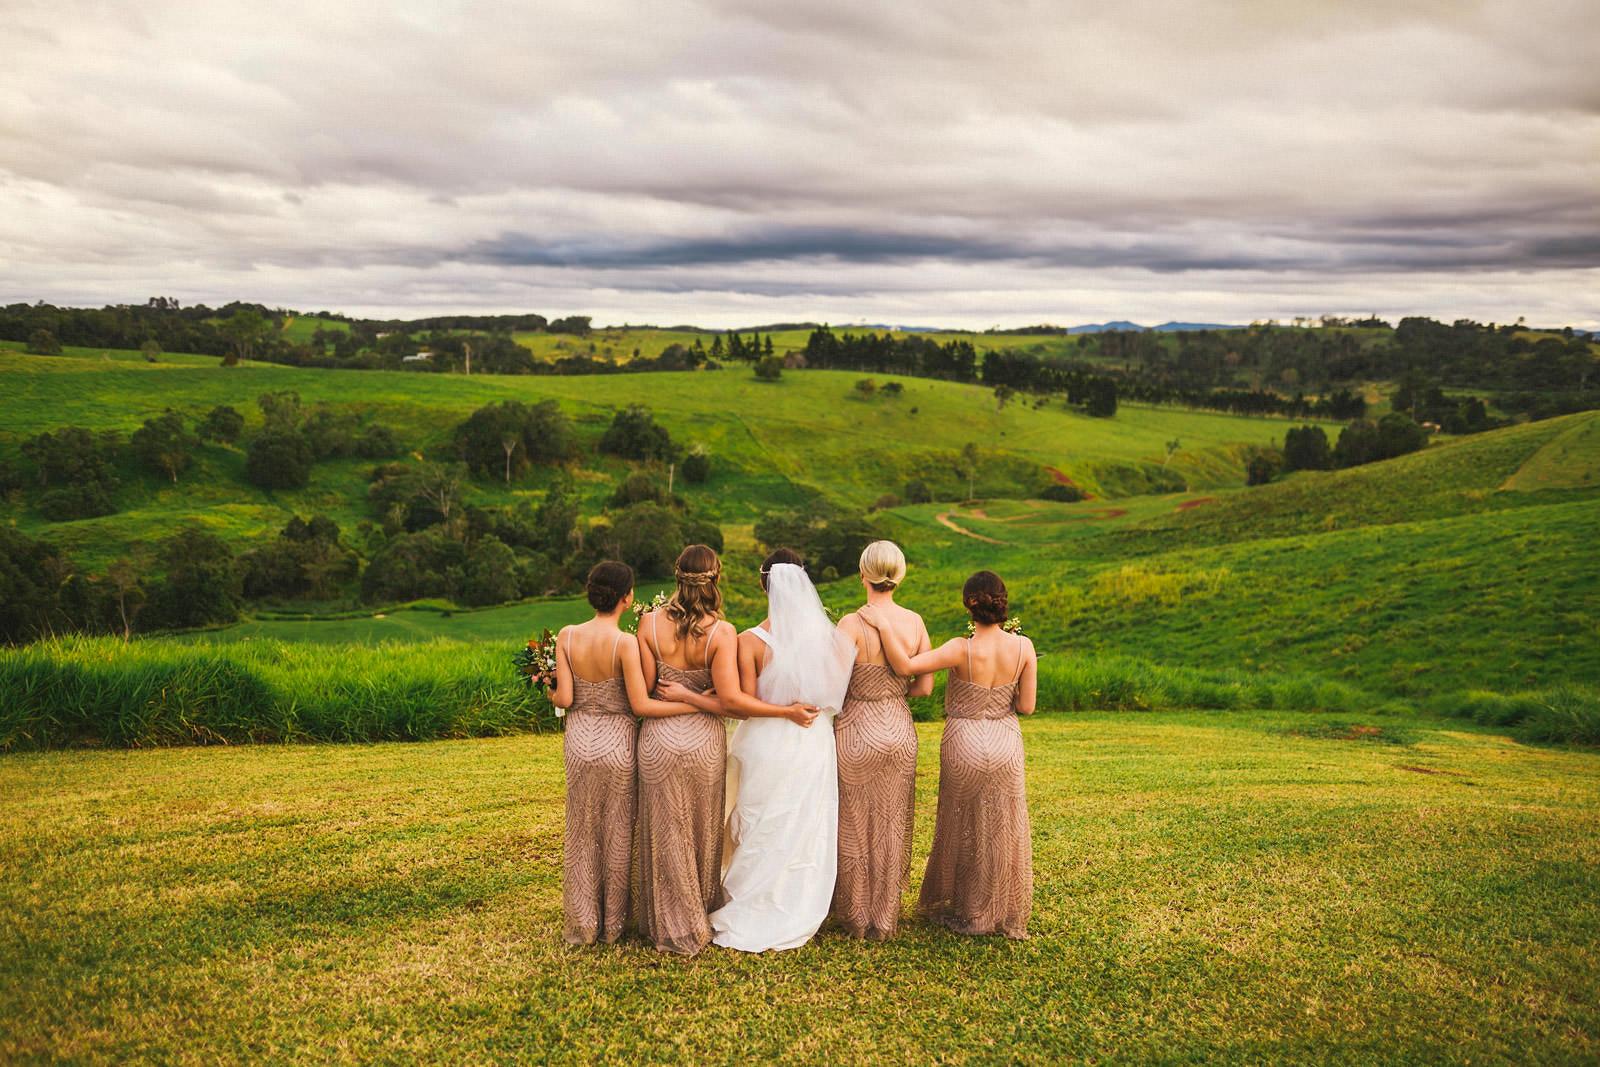 tablelands_wedding_0028